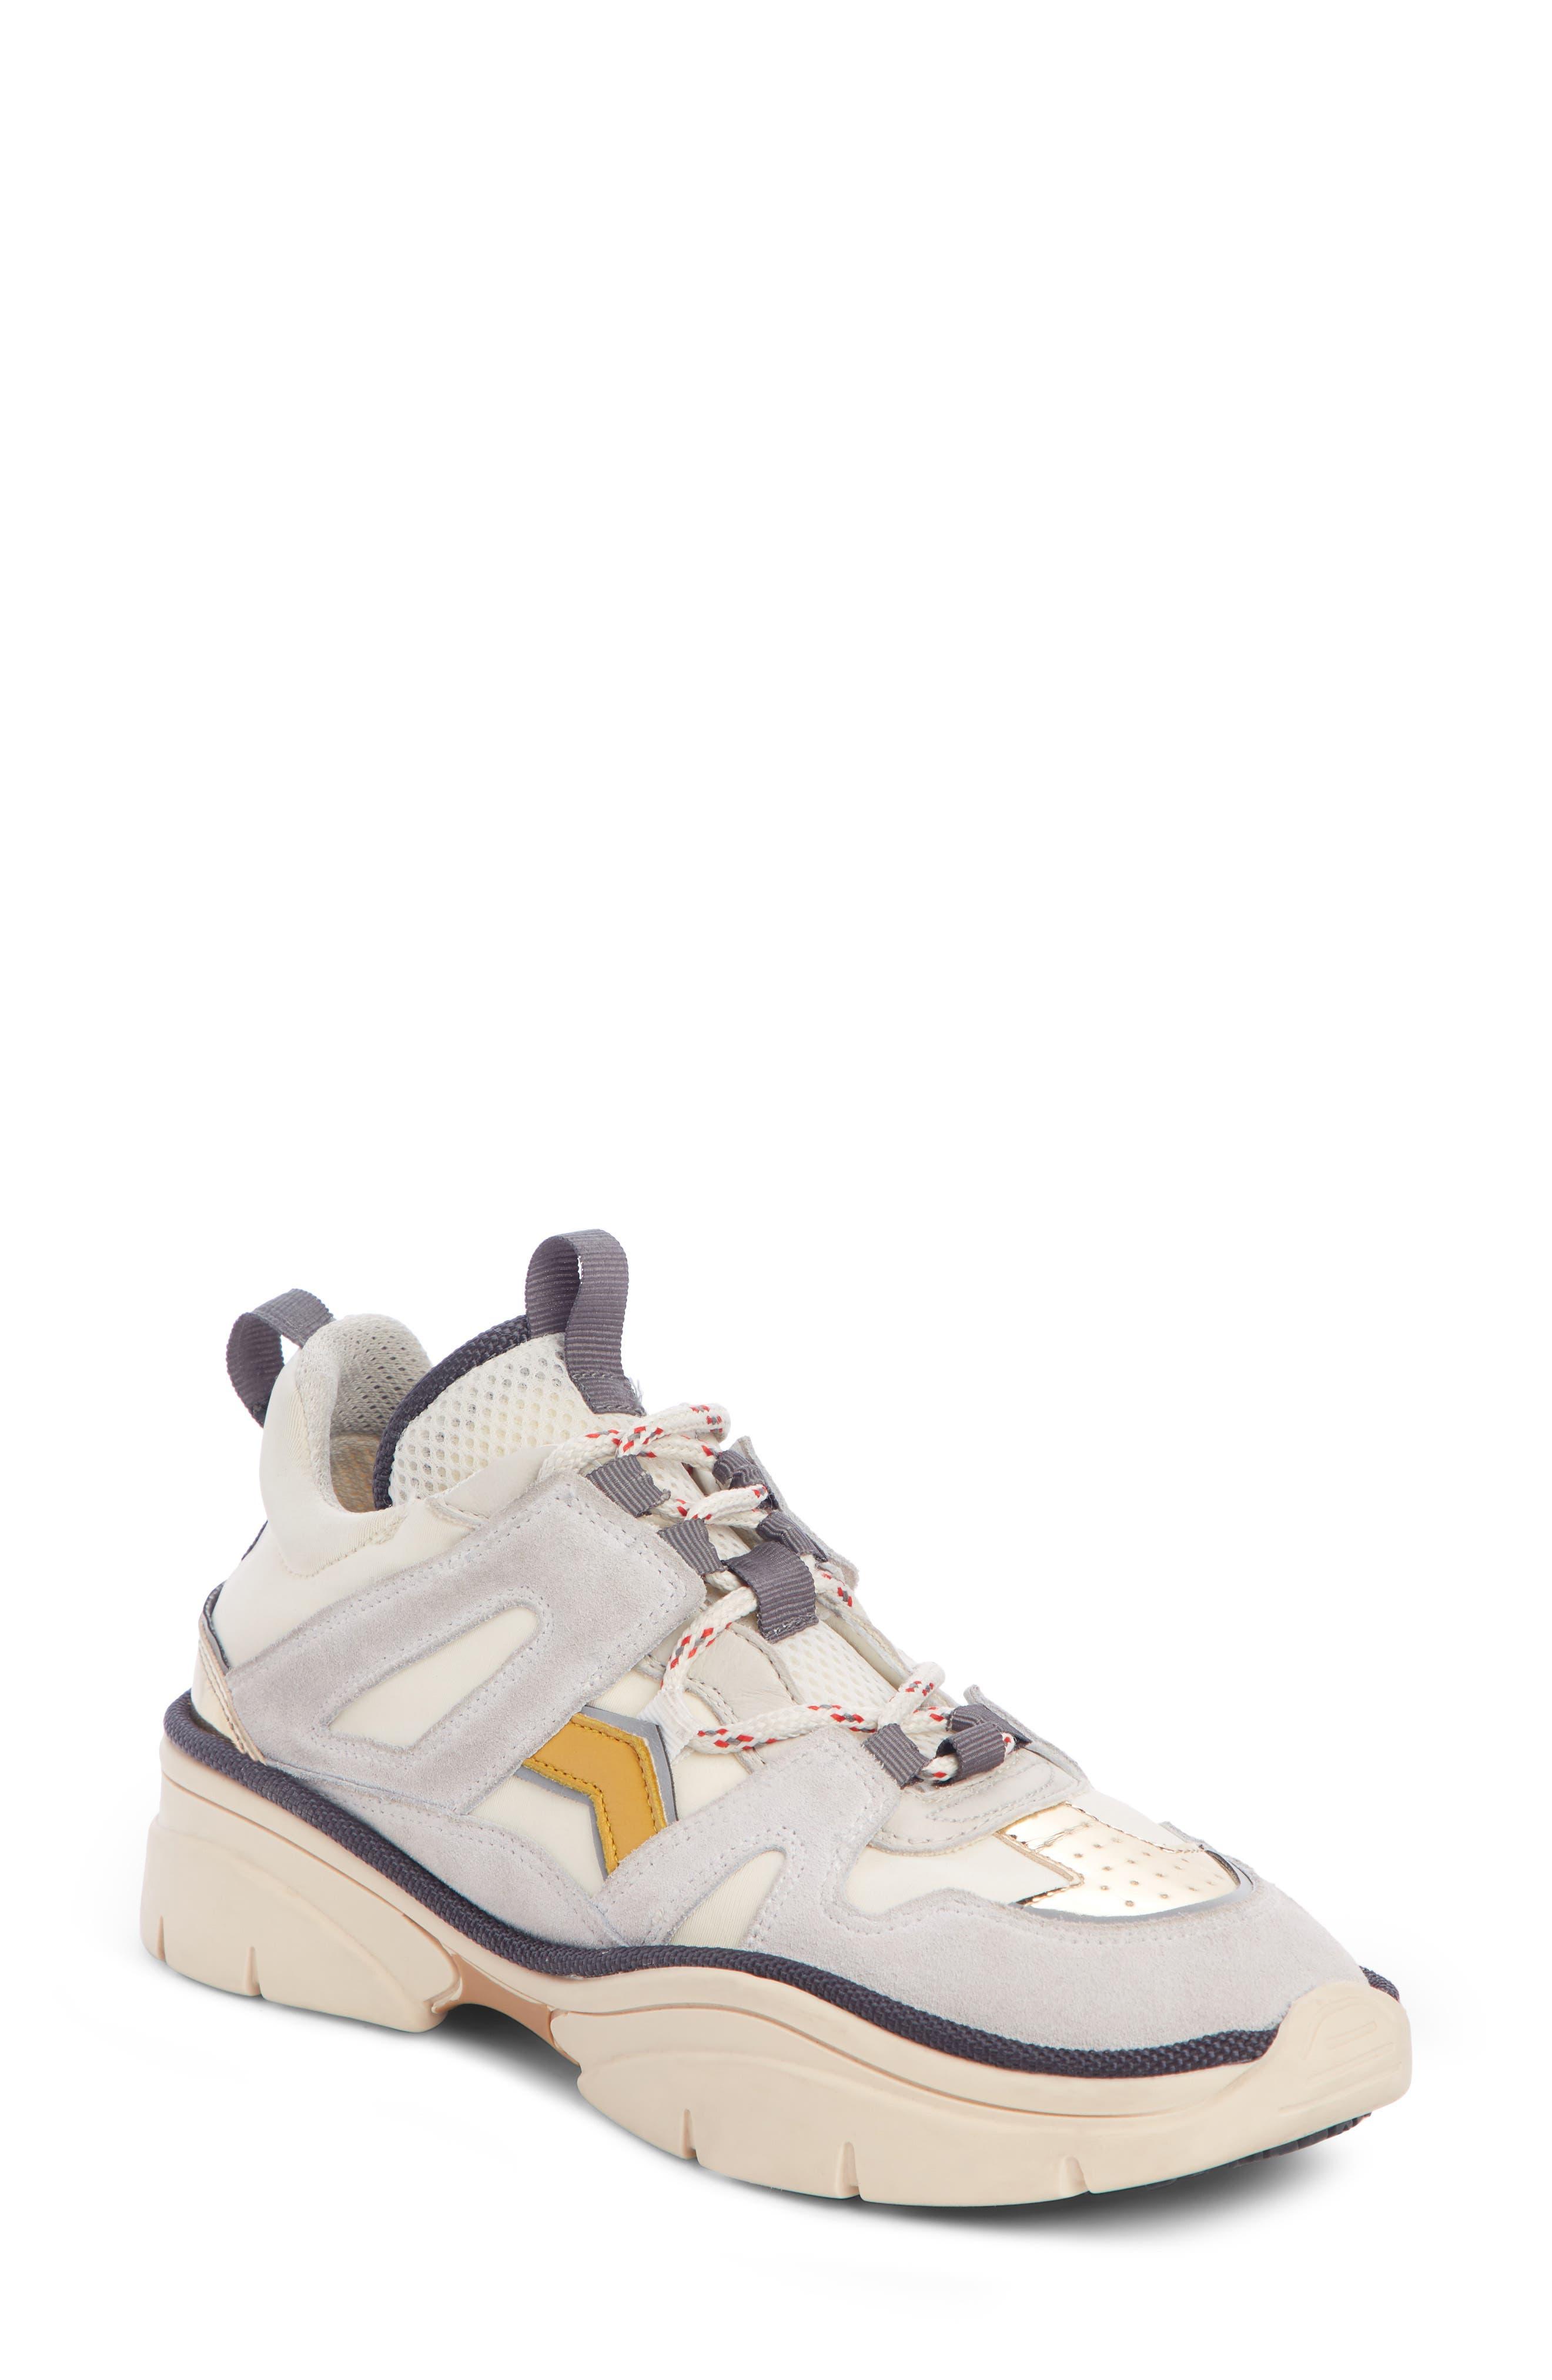 Kindsay Lace-Up Sneaker,                             Main thumbnail 1, color,                             WHITE